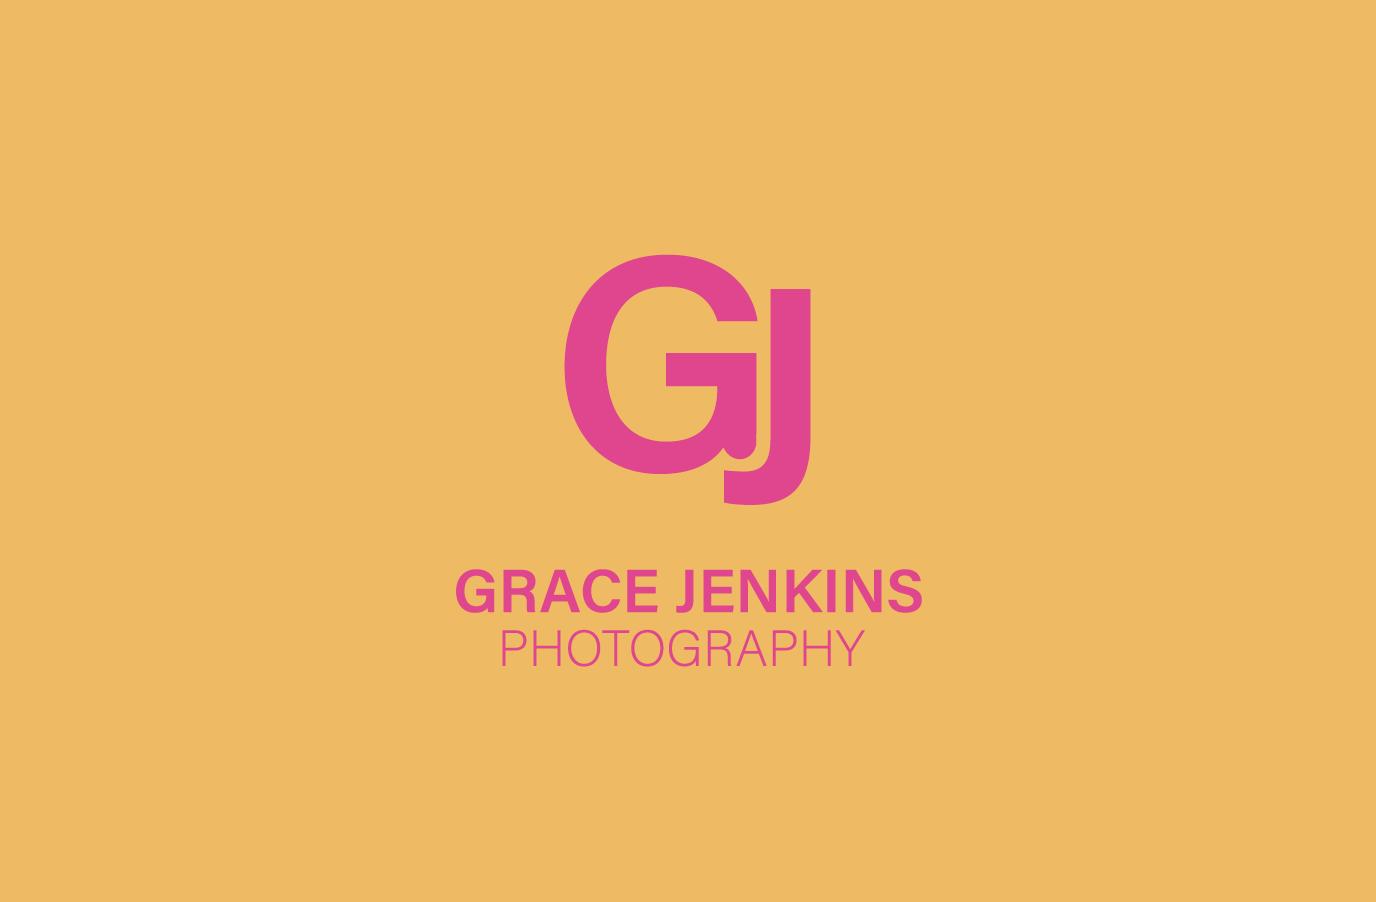 Grace Jenkins